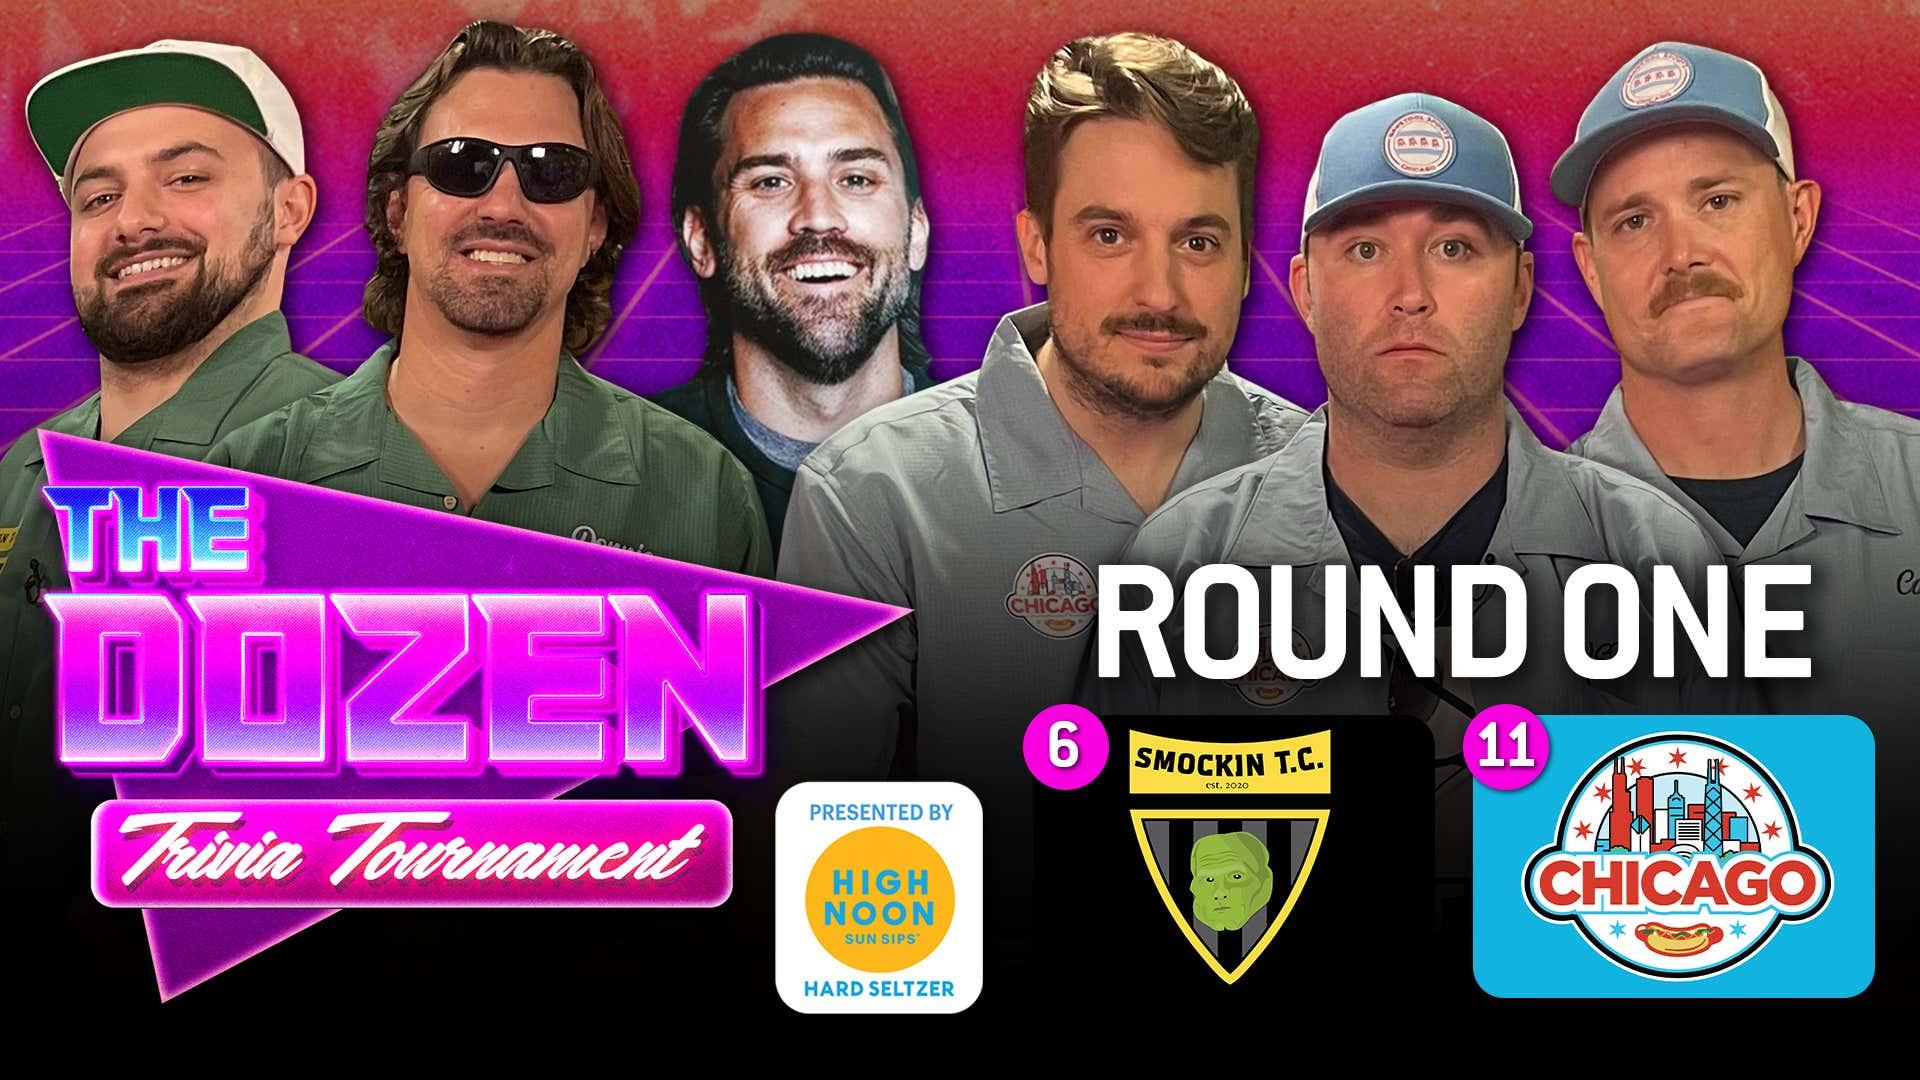 Smockin vs. Chicago (The Dozen: Trivia Tournament pres. by High Noon Match 03)